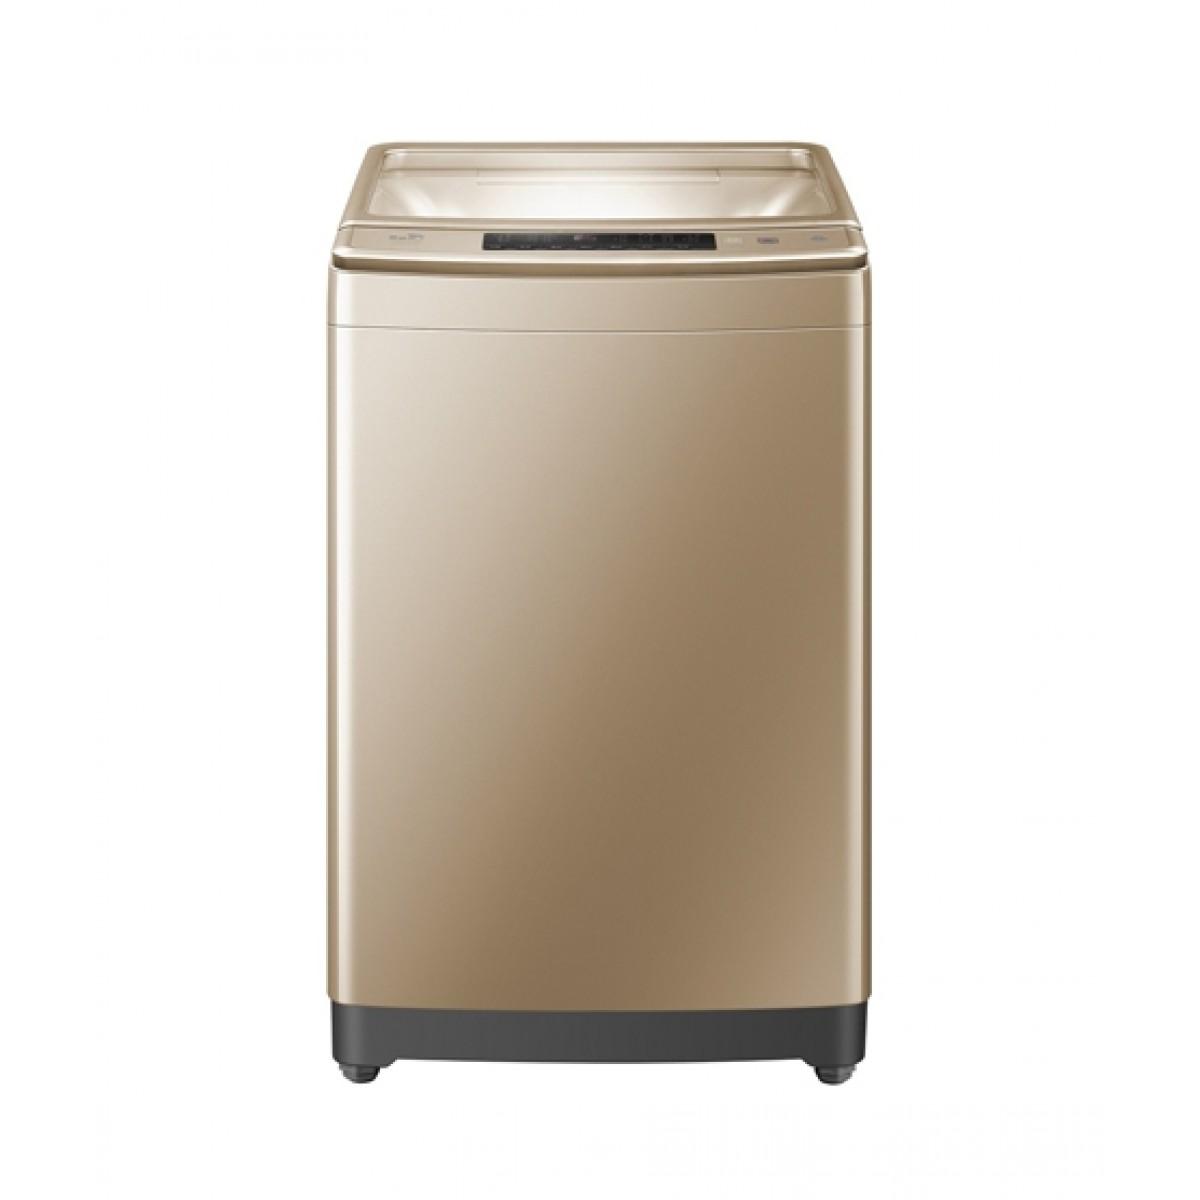 Haier Top Load Fully Automatic Washing Machine 11kg Hwm 110 1789